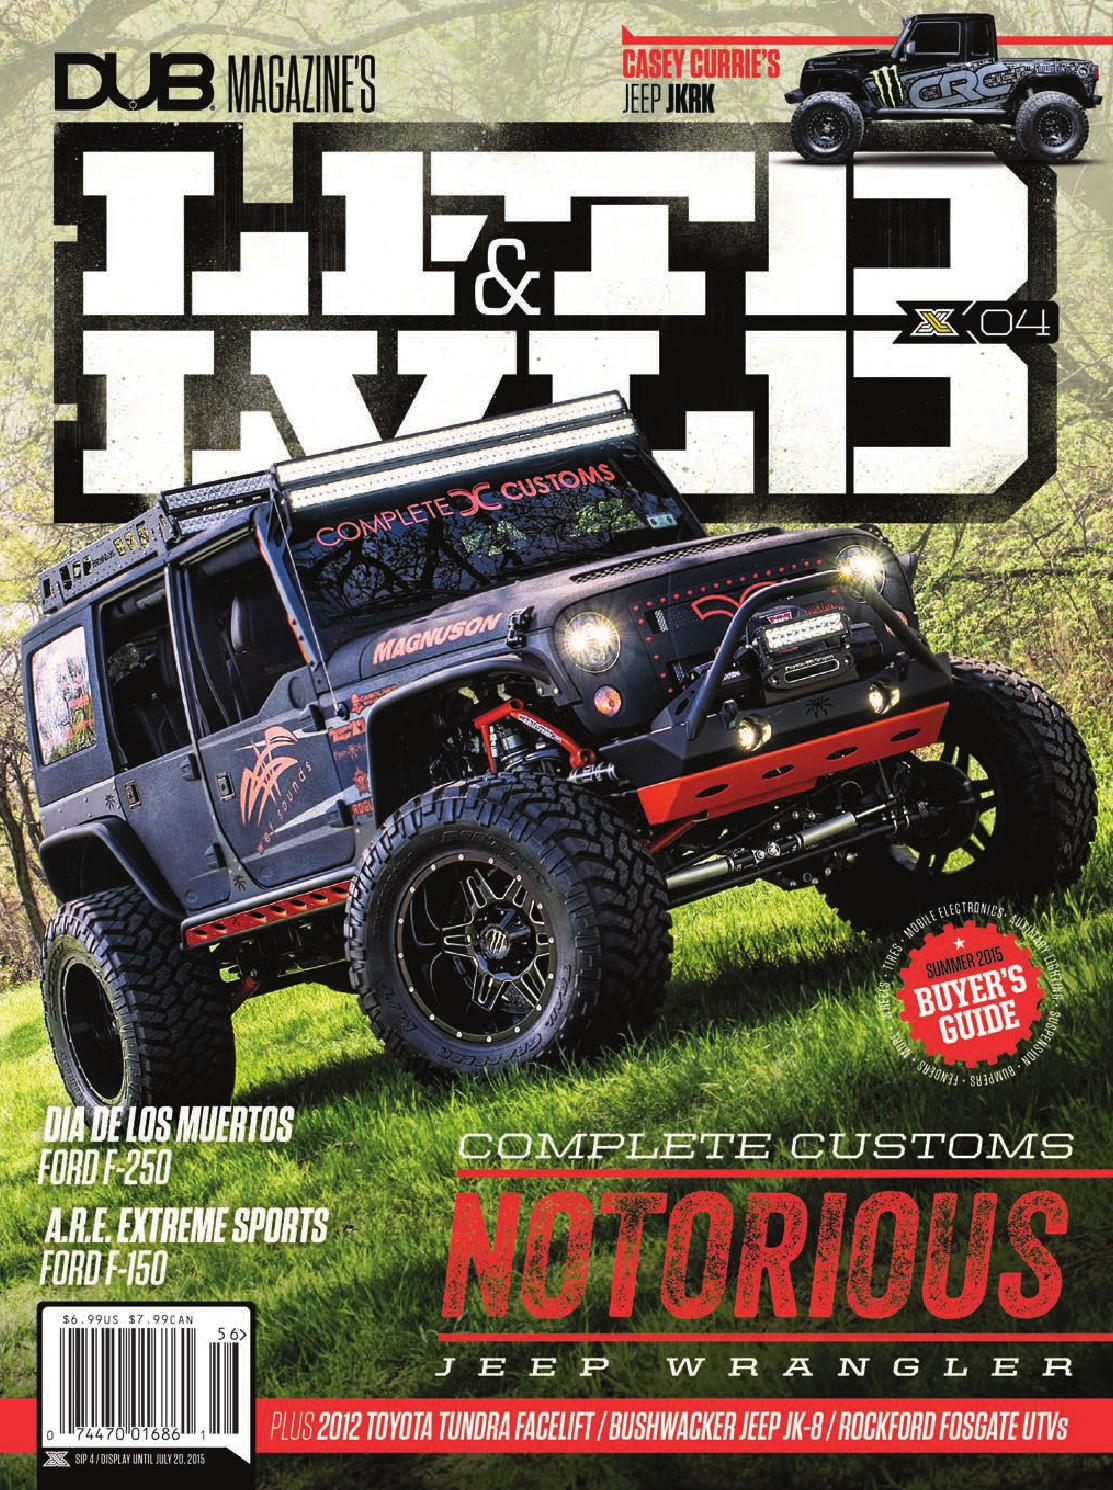 Dub Magazines Lftdlvld Issue 4 By Issuu Hit Auta 2040 Car Electric Antenna Universal Fitting